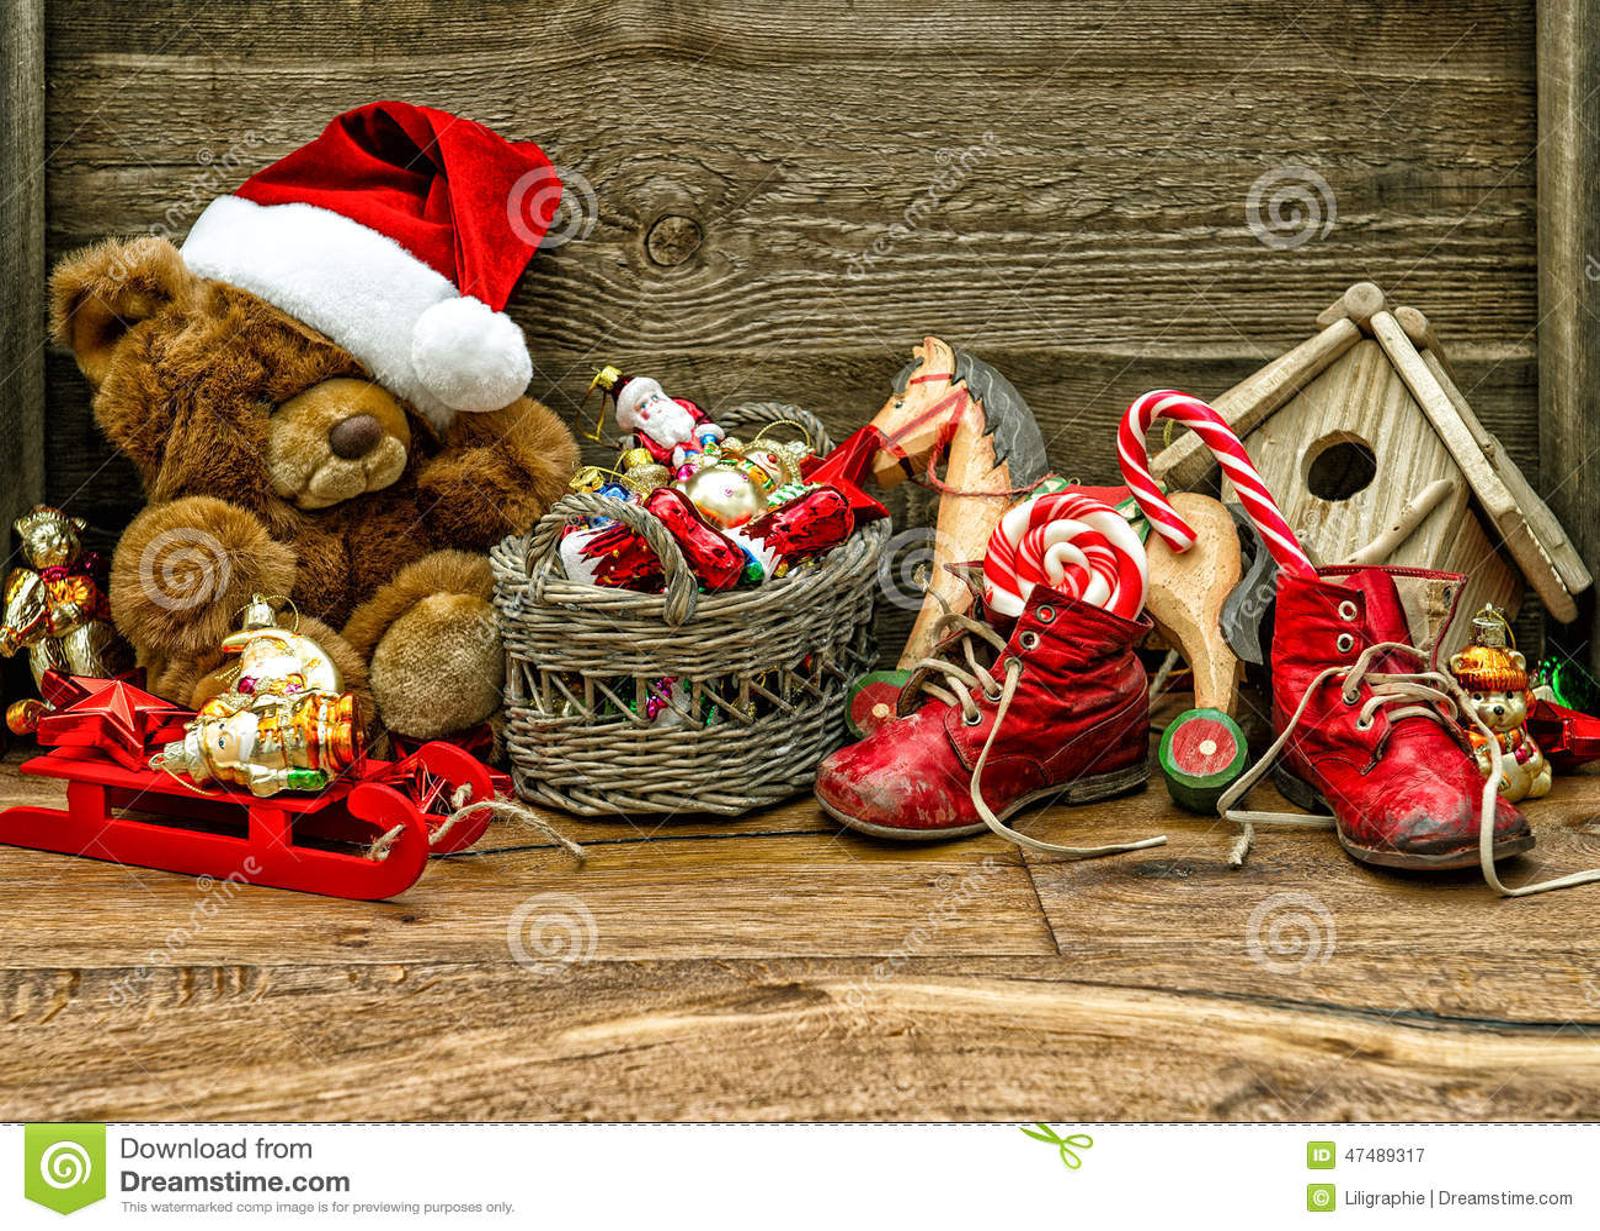 Nostalgic Christmas Decorations With Antique Toys Stock